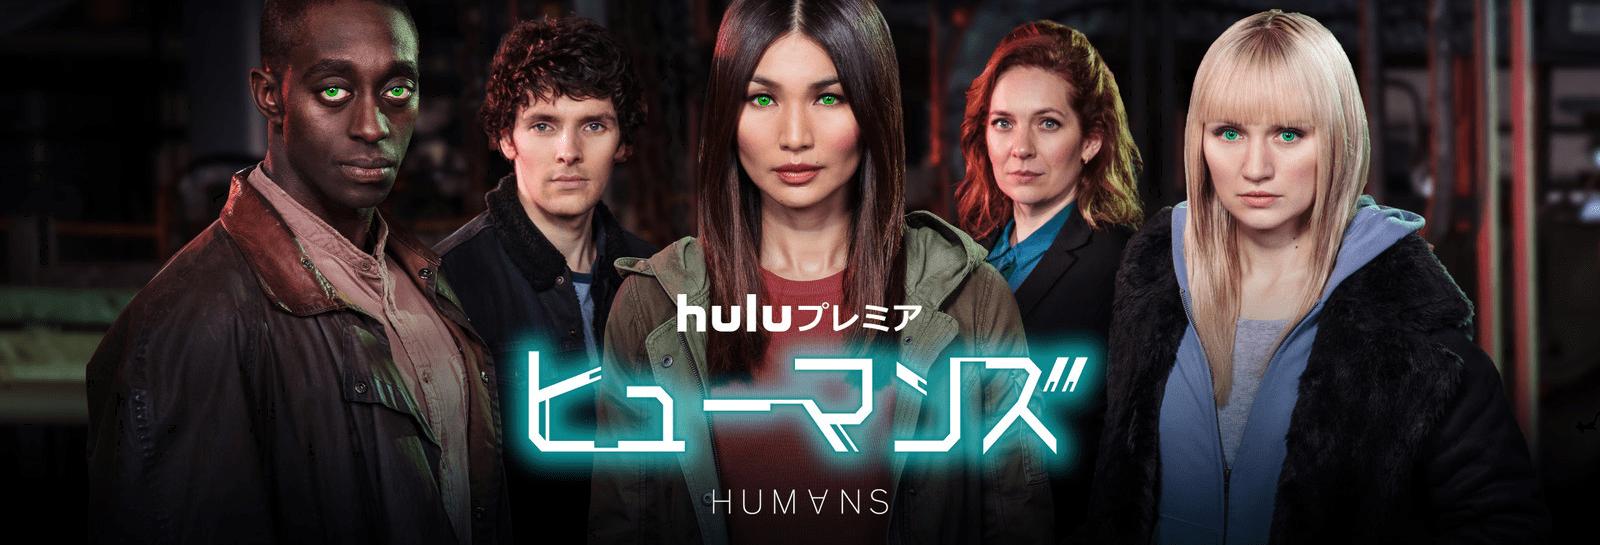 【Huluおすすめ海外ドラマ】Hulu(フールー)のおすすめ海外ドラマ作品一覧|ウォーキングデッド・ゲームオブスローンズ・Huluプレミア作品など充実!|Huluプレミア編:ヒューマンズ